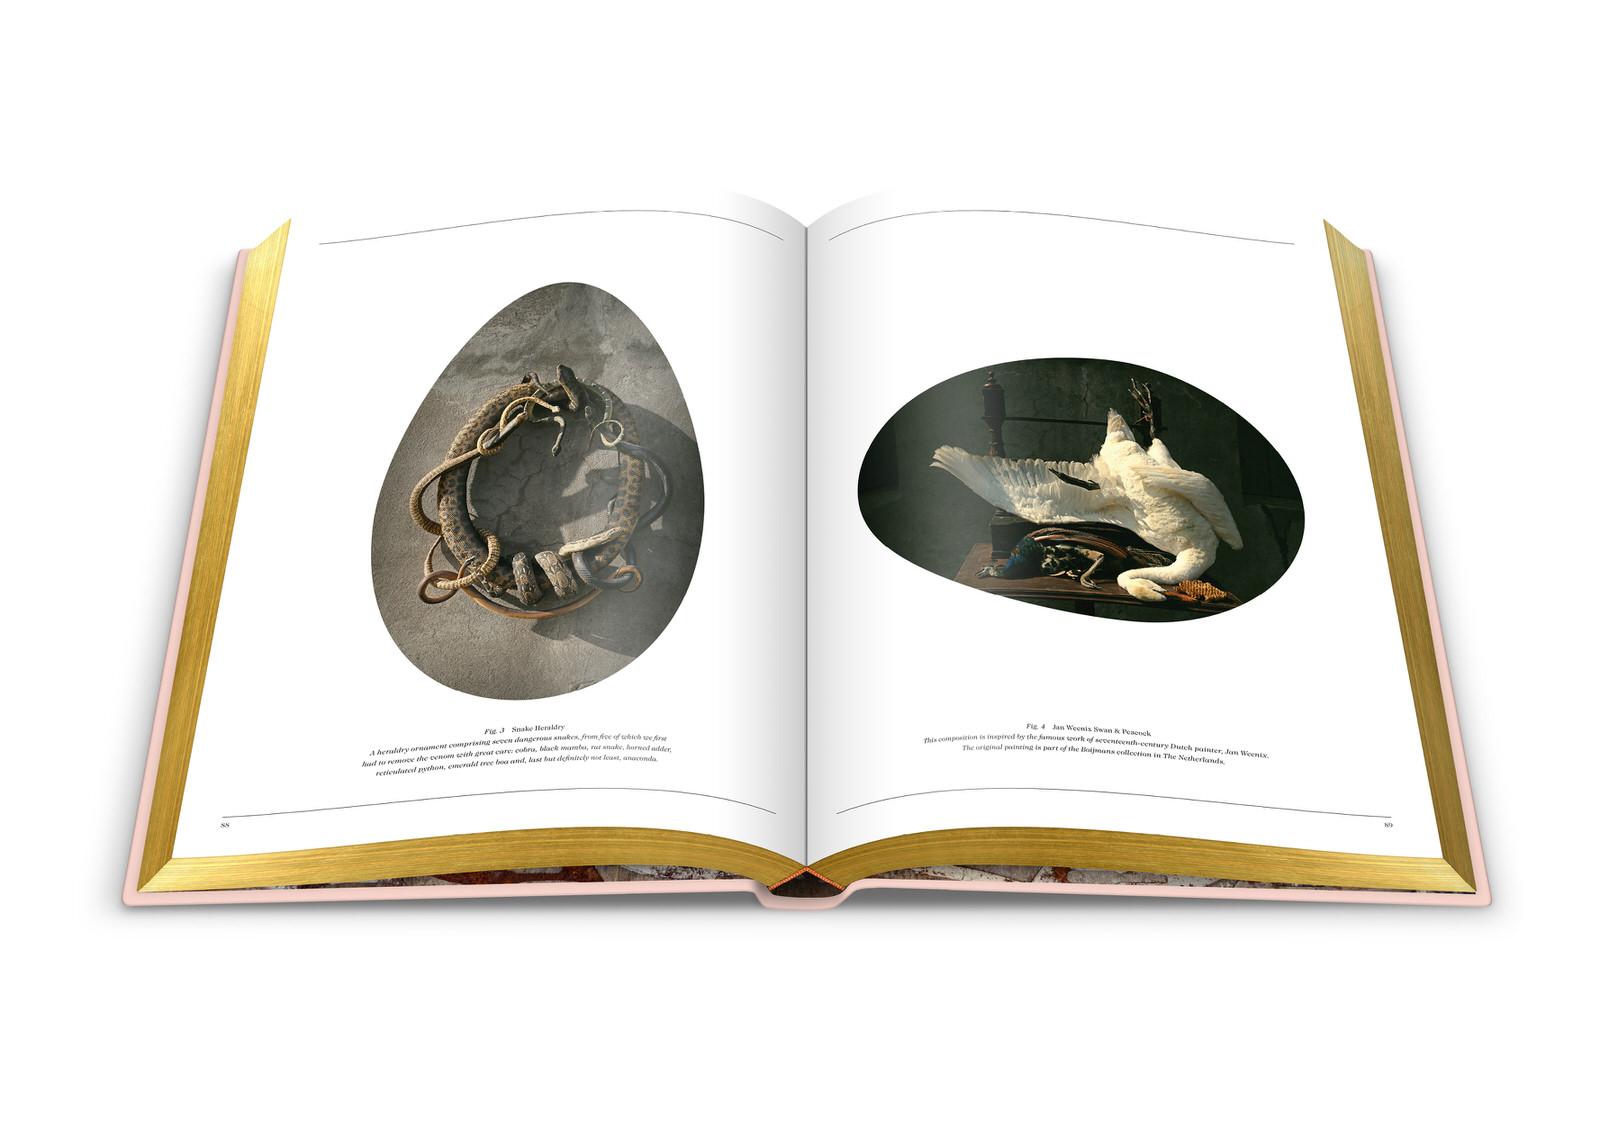 008-DSvT-Our-First-Book-Spread-First-Show-2.jpg